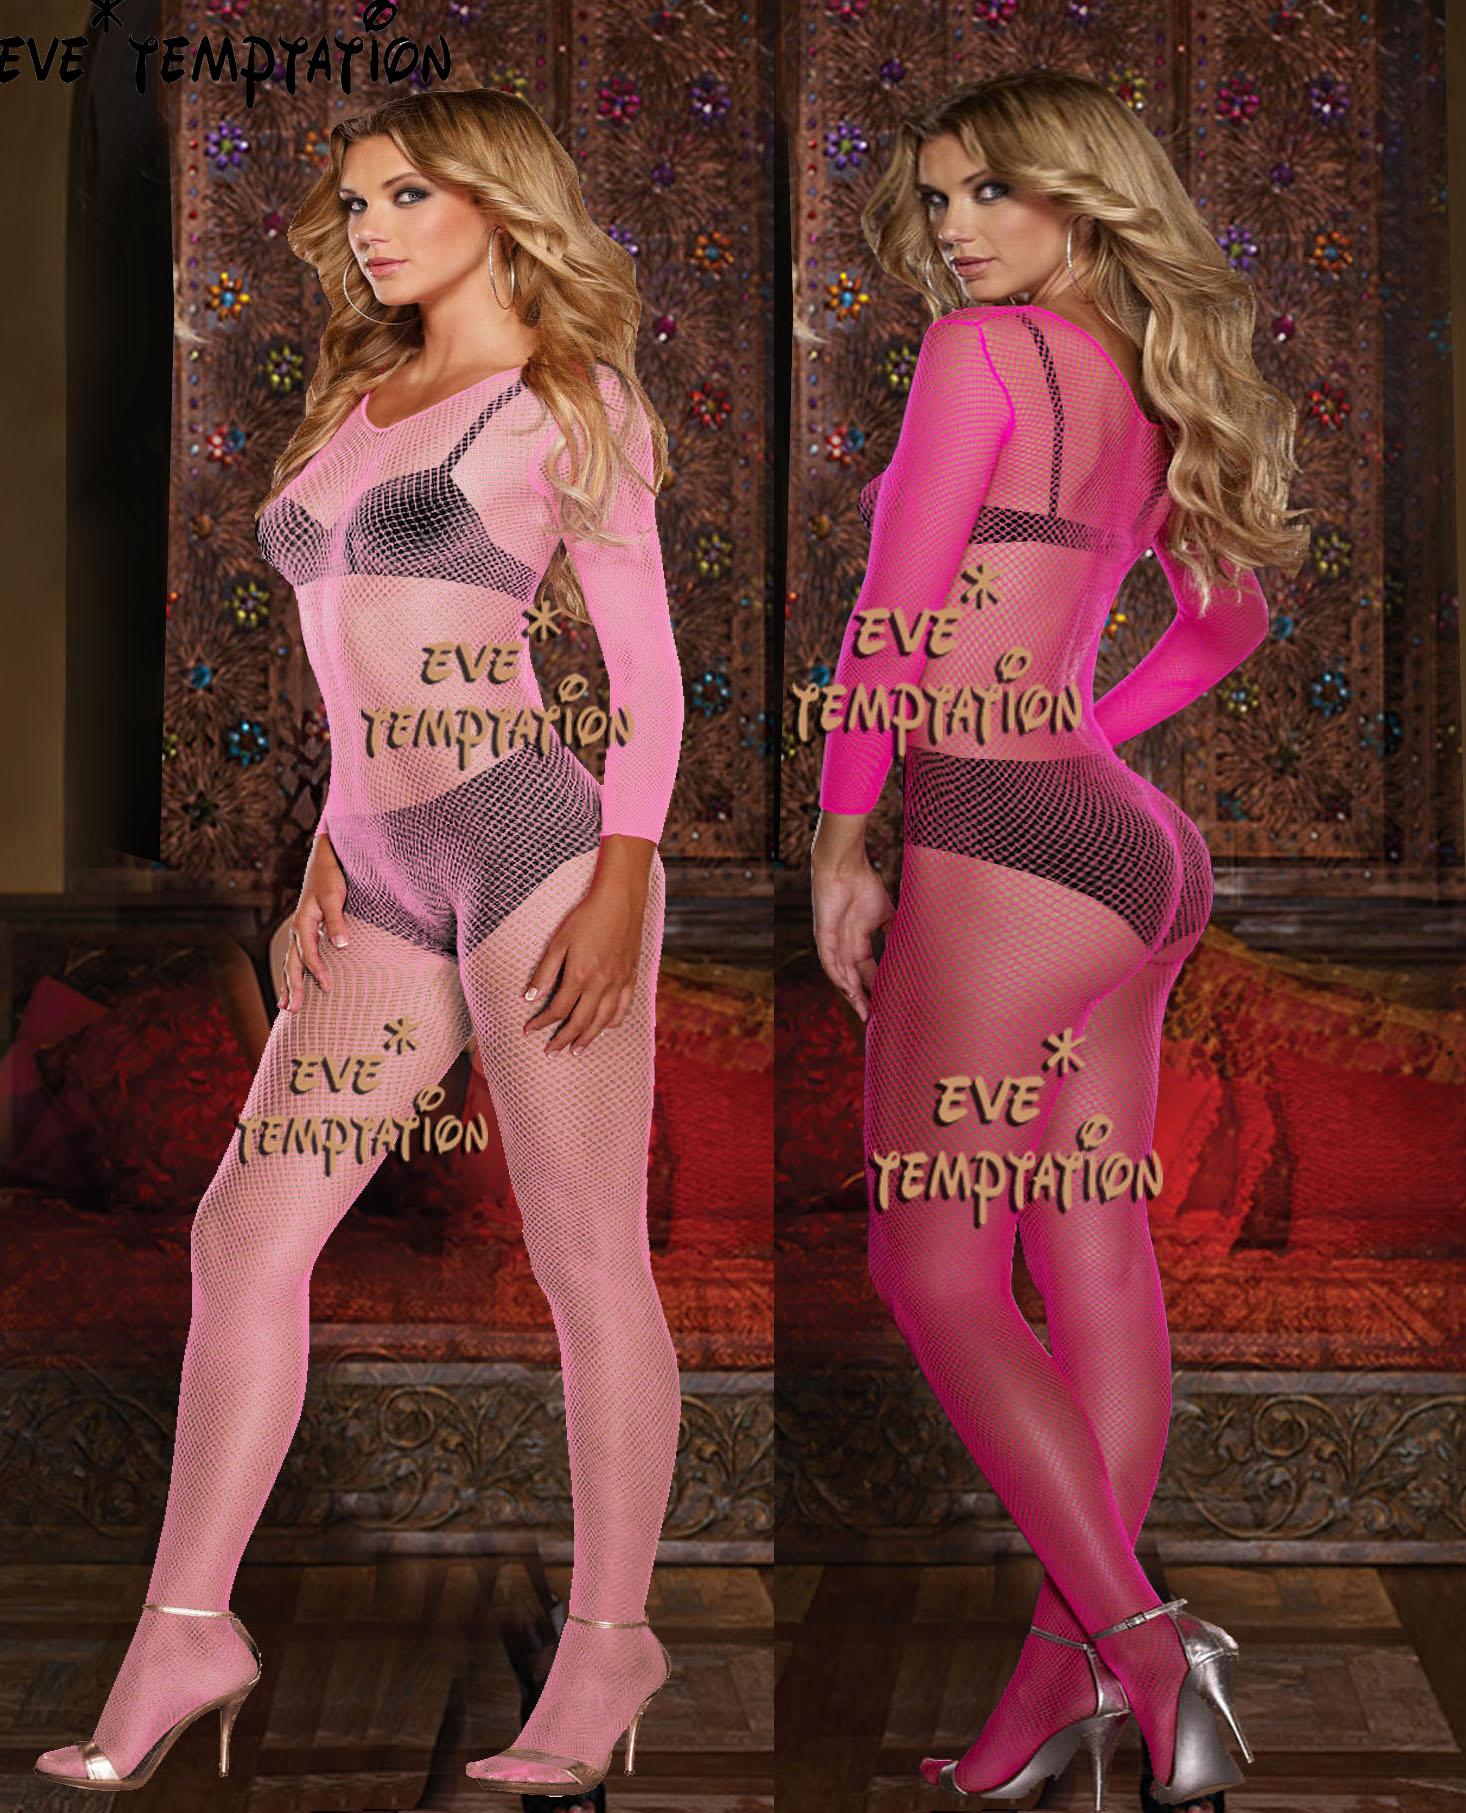 HOT Sexy Adult Sleepwear Lingerie Babydoll BODYSUIT Mesh Floral Body Stocking Intimate Perforate Sleepwear Teddy Dolls W013